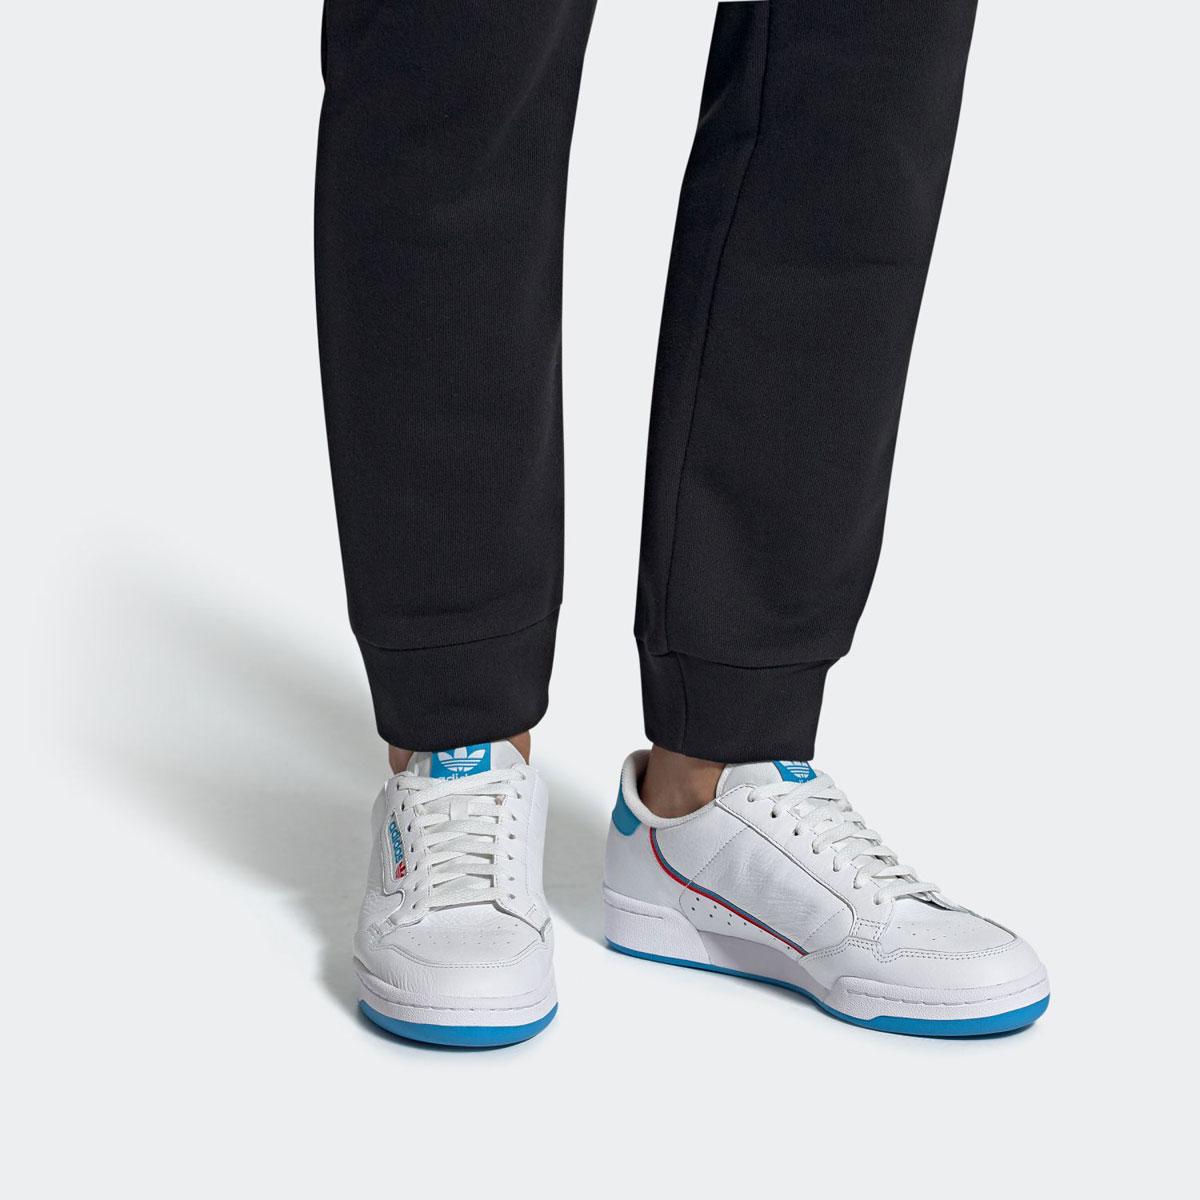 adidas Originals CONTINENTAL 80(FTWR WHITE/SHOCK CYAN/FTWR WHITE)(アディダスオリジナルス コンチネンタル 80)【メンズ】【レディース】【スニーカー】【19SS-I】